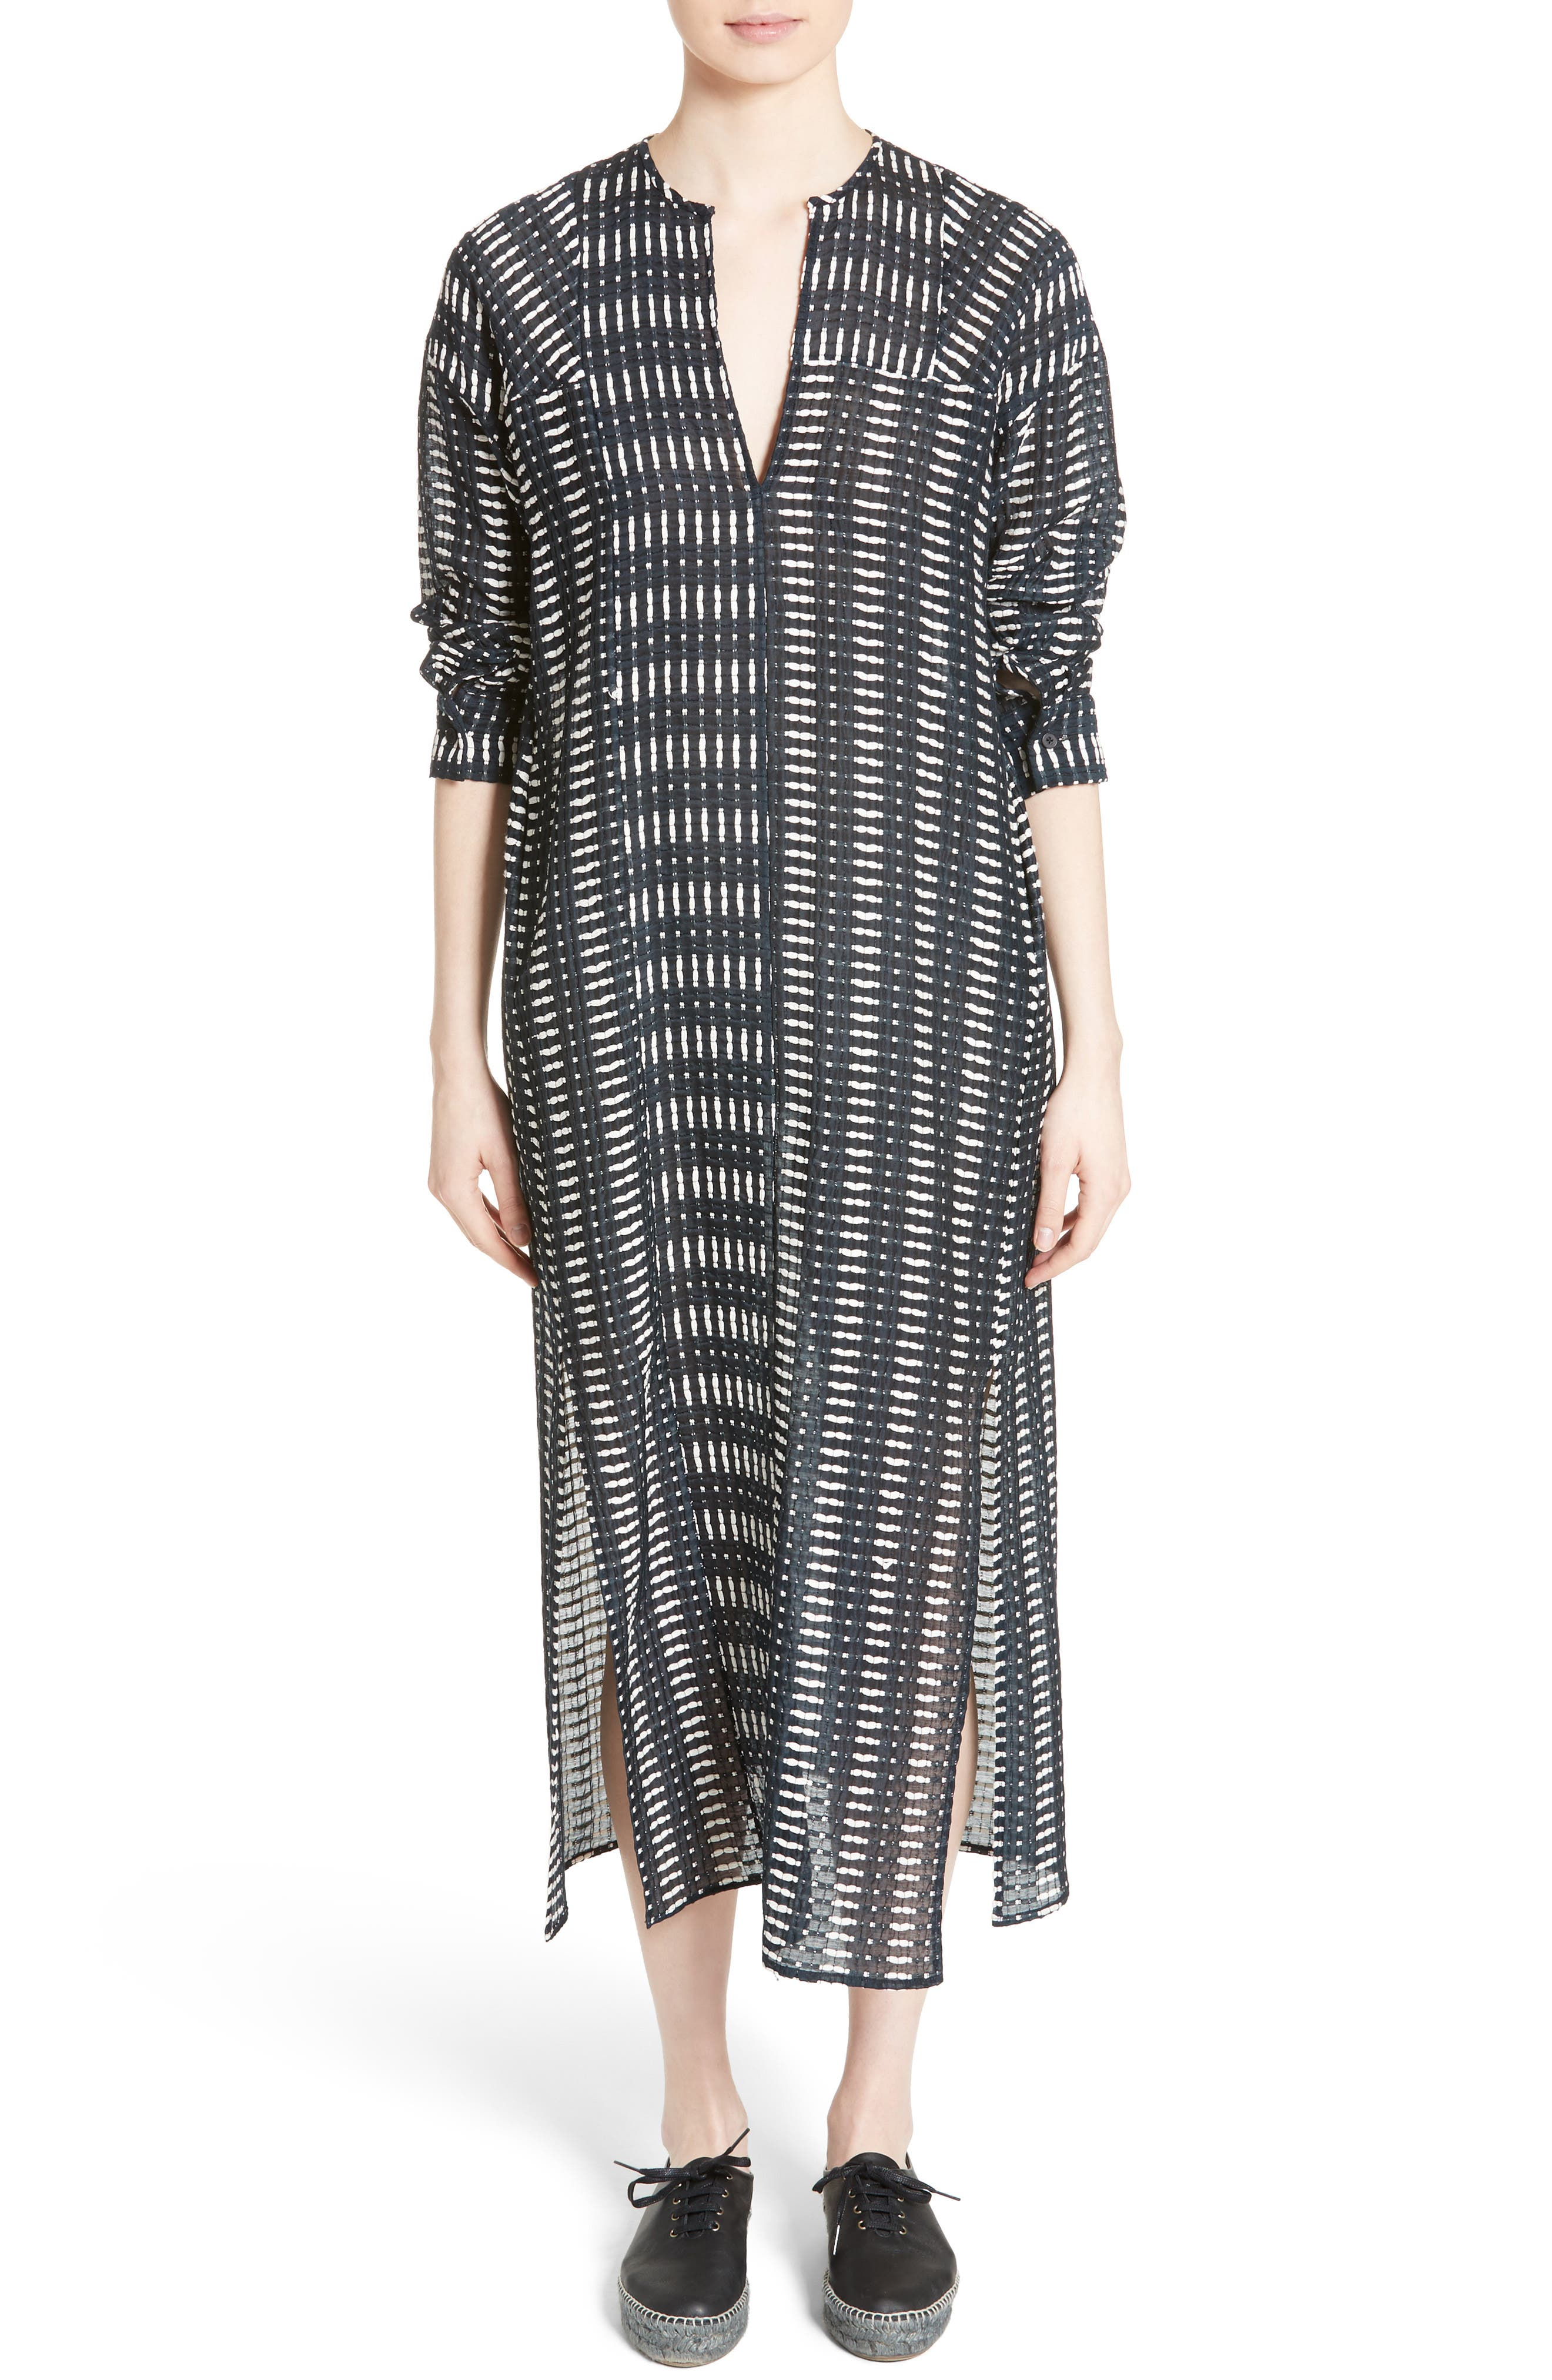 Zero + Maria Cornejo Ire DNA Remix Dress